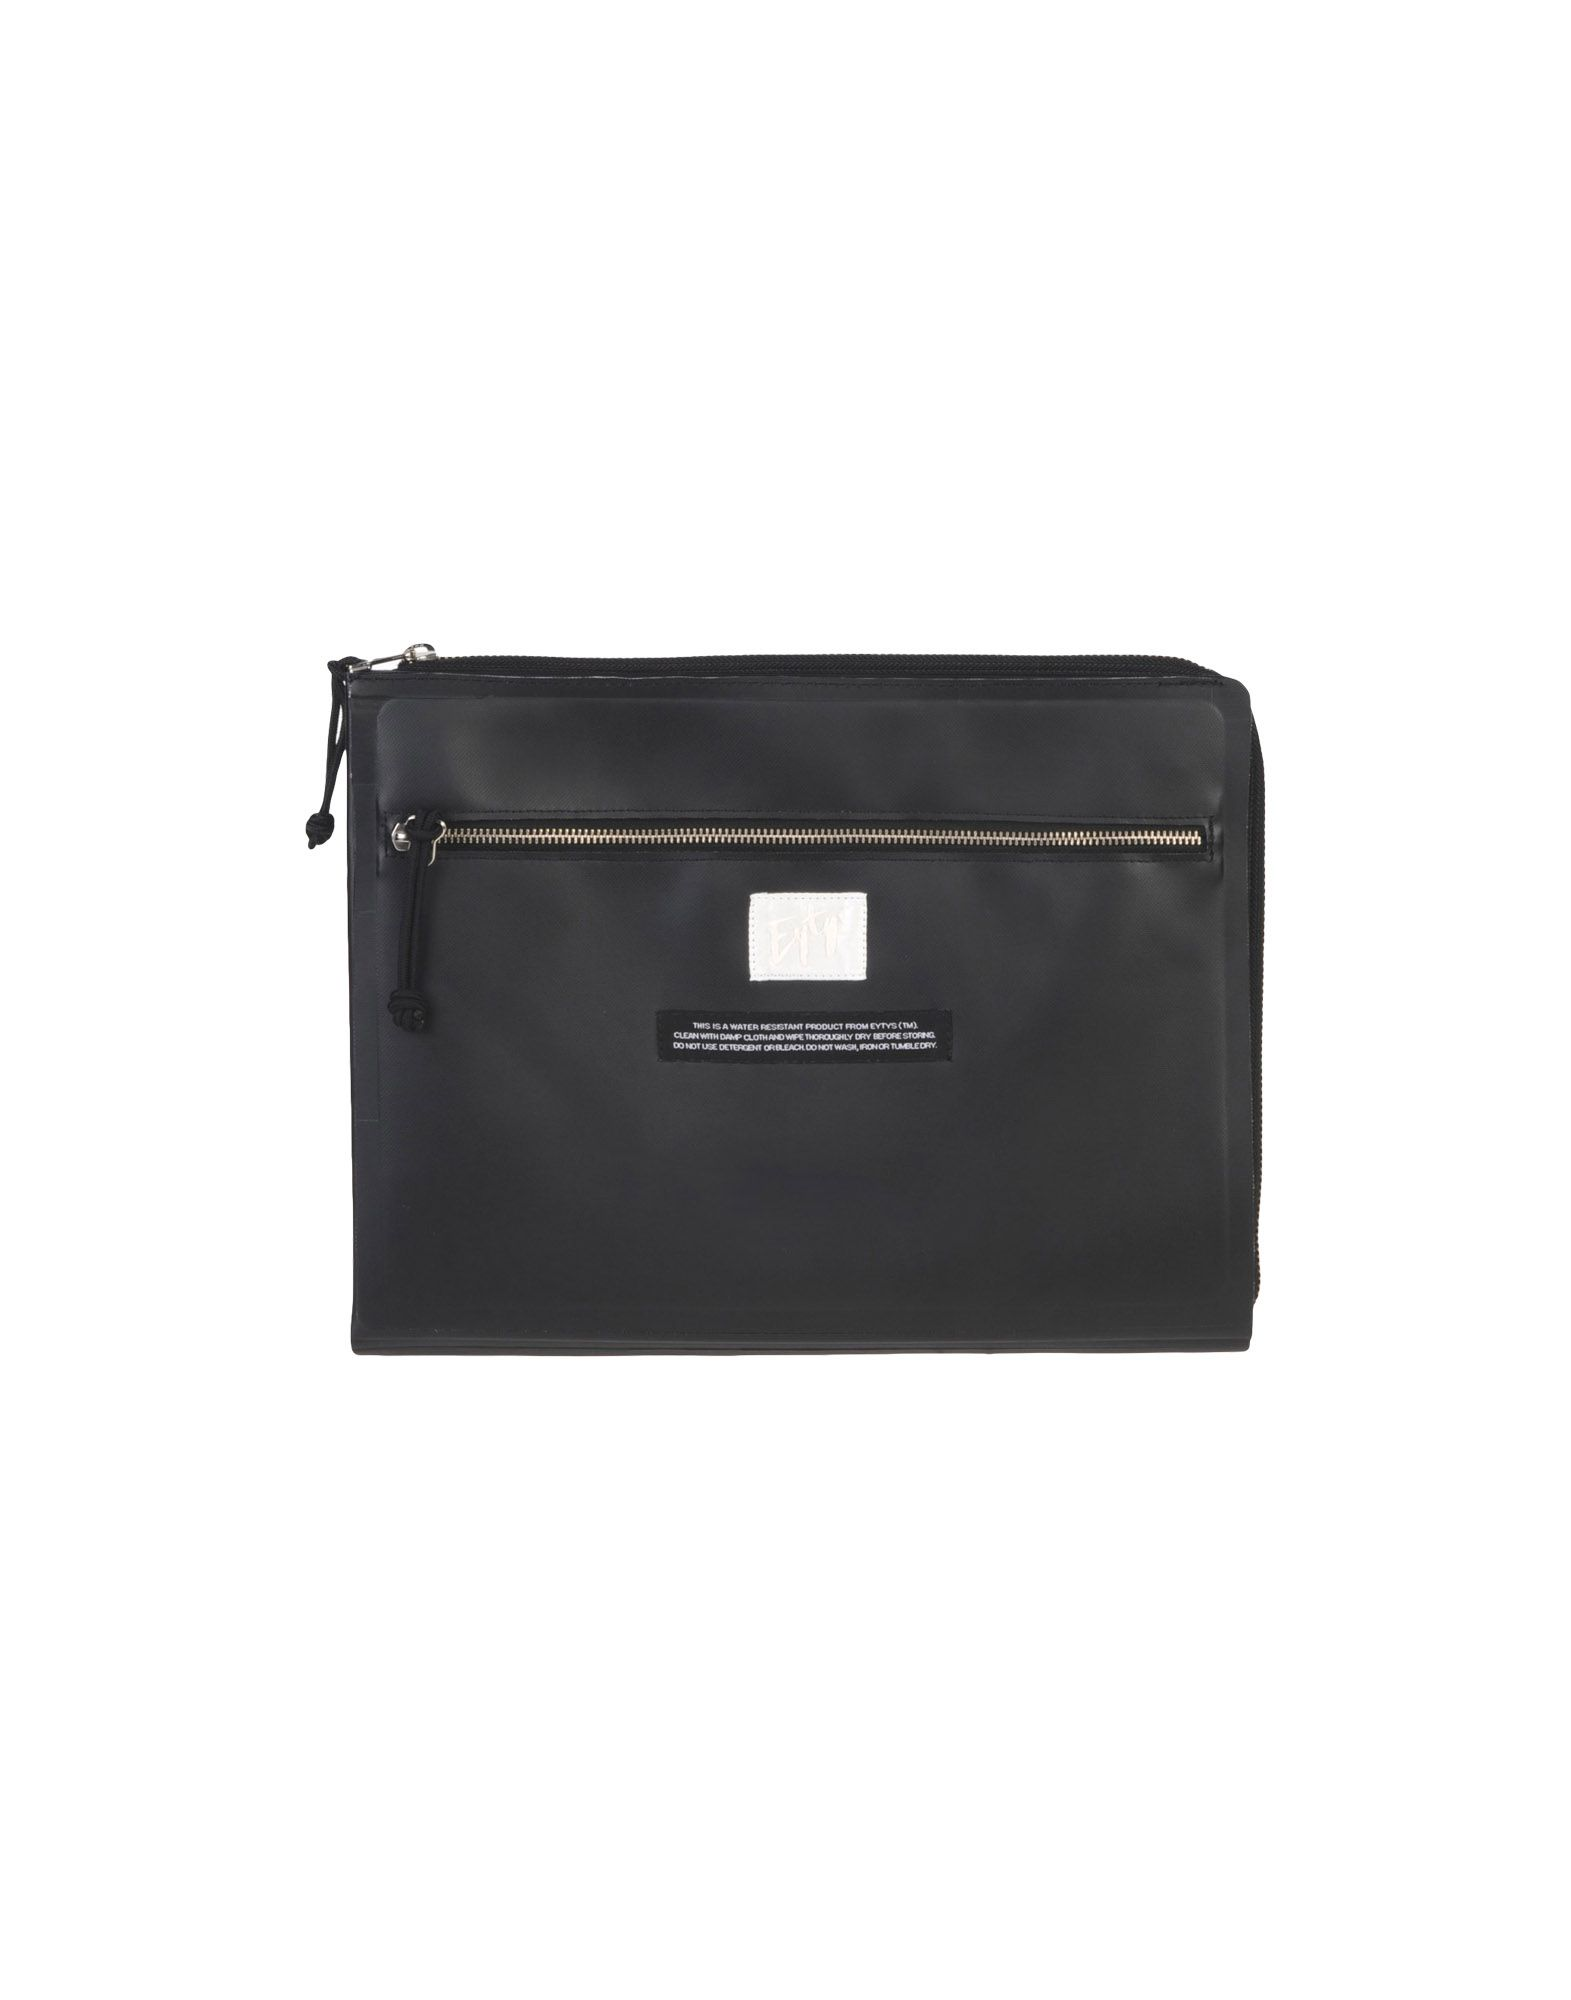 EYTYS Деловые сумки bag emilio masi сумки деловые